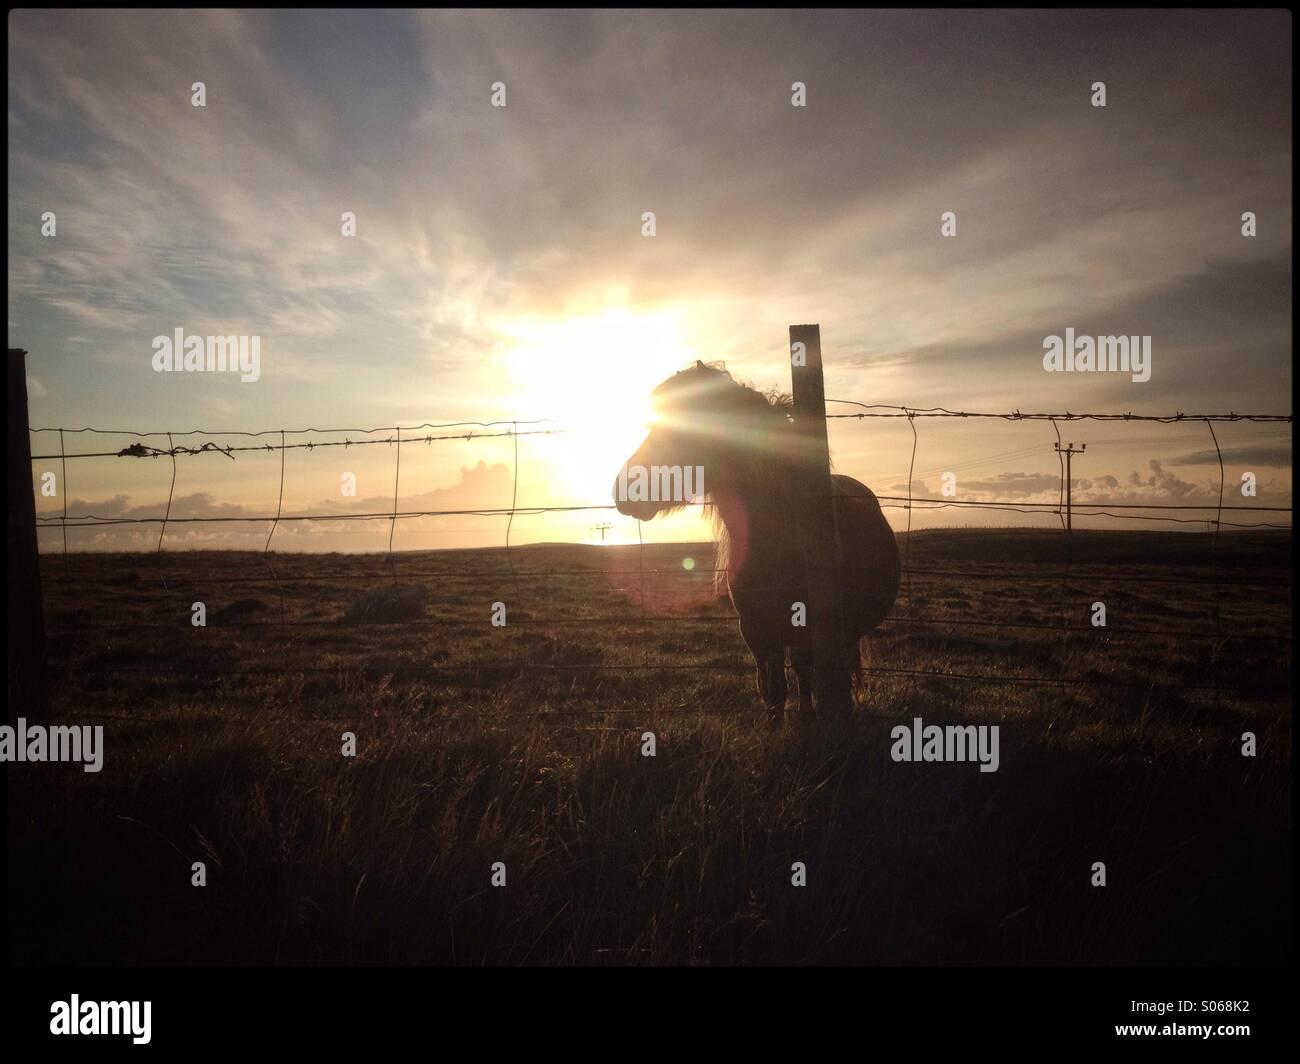 Shetland Pony behind fence in Shetland. Lee Ramsden / ALAMY Stock Photo